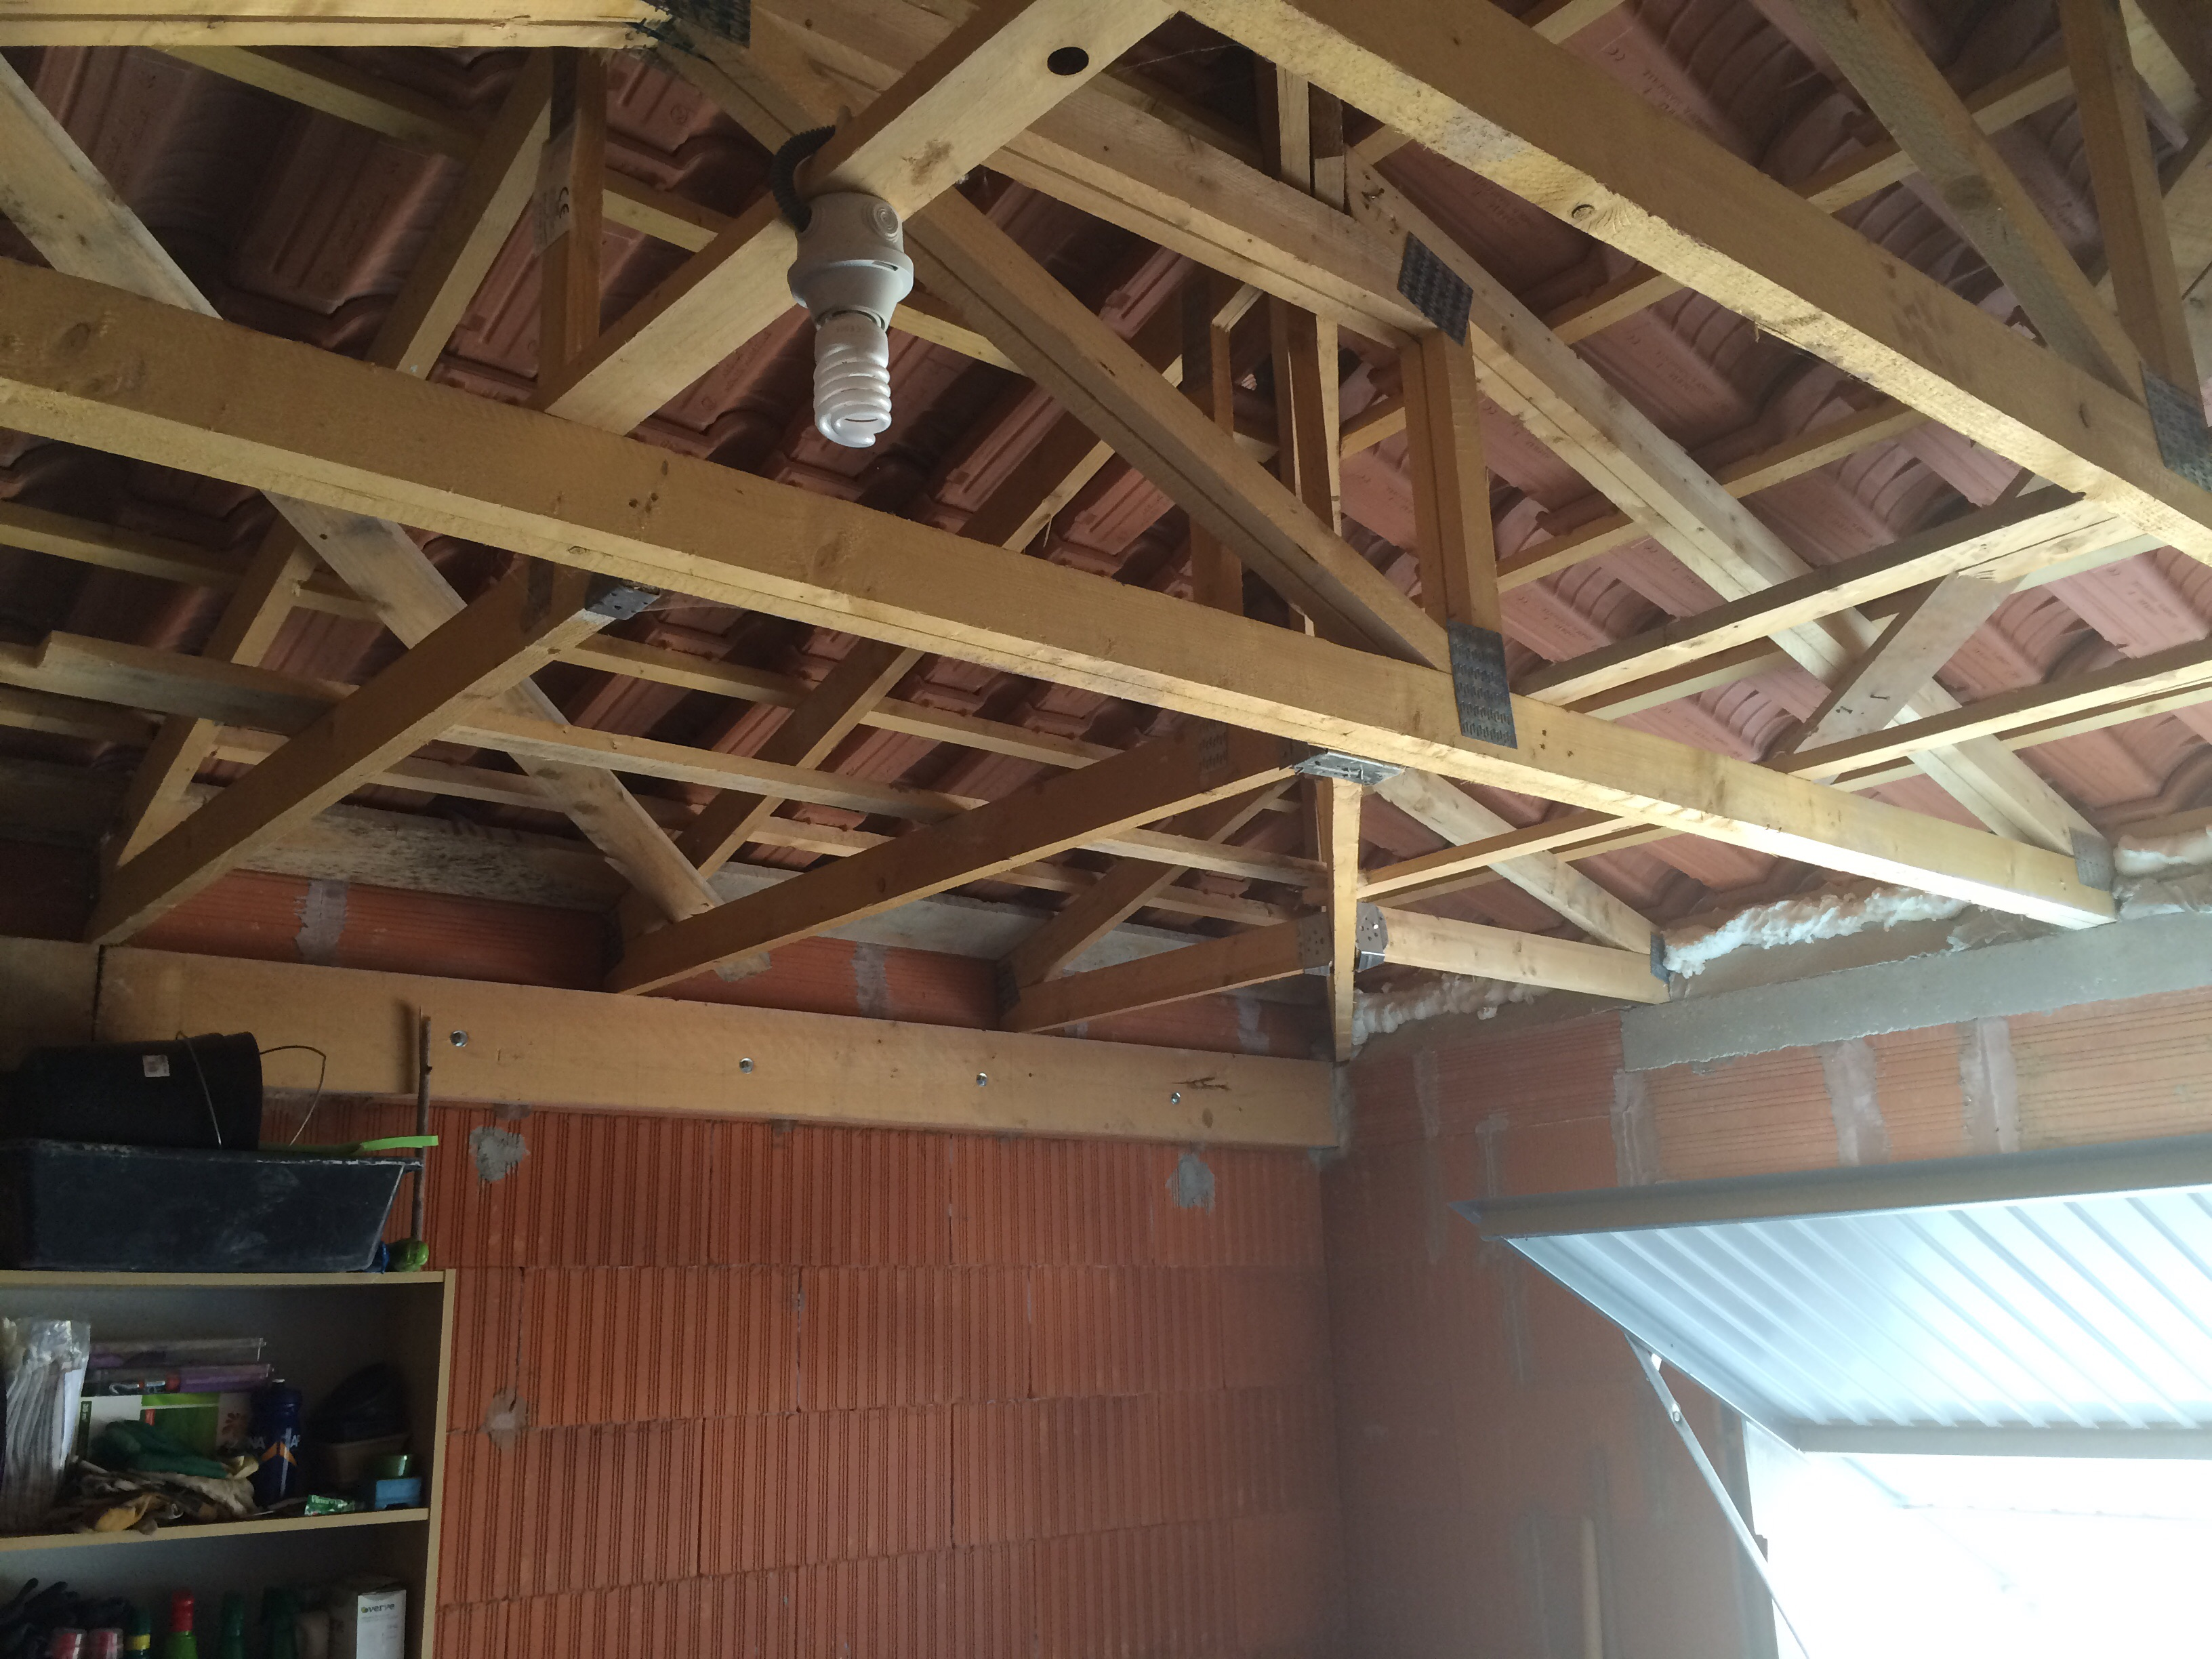 plafond suspendu sur charpente 3 pentes communaut leroy merlin. Black Bedroom Furniture Sets. Home Design Ideas